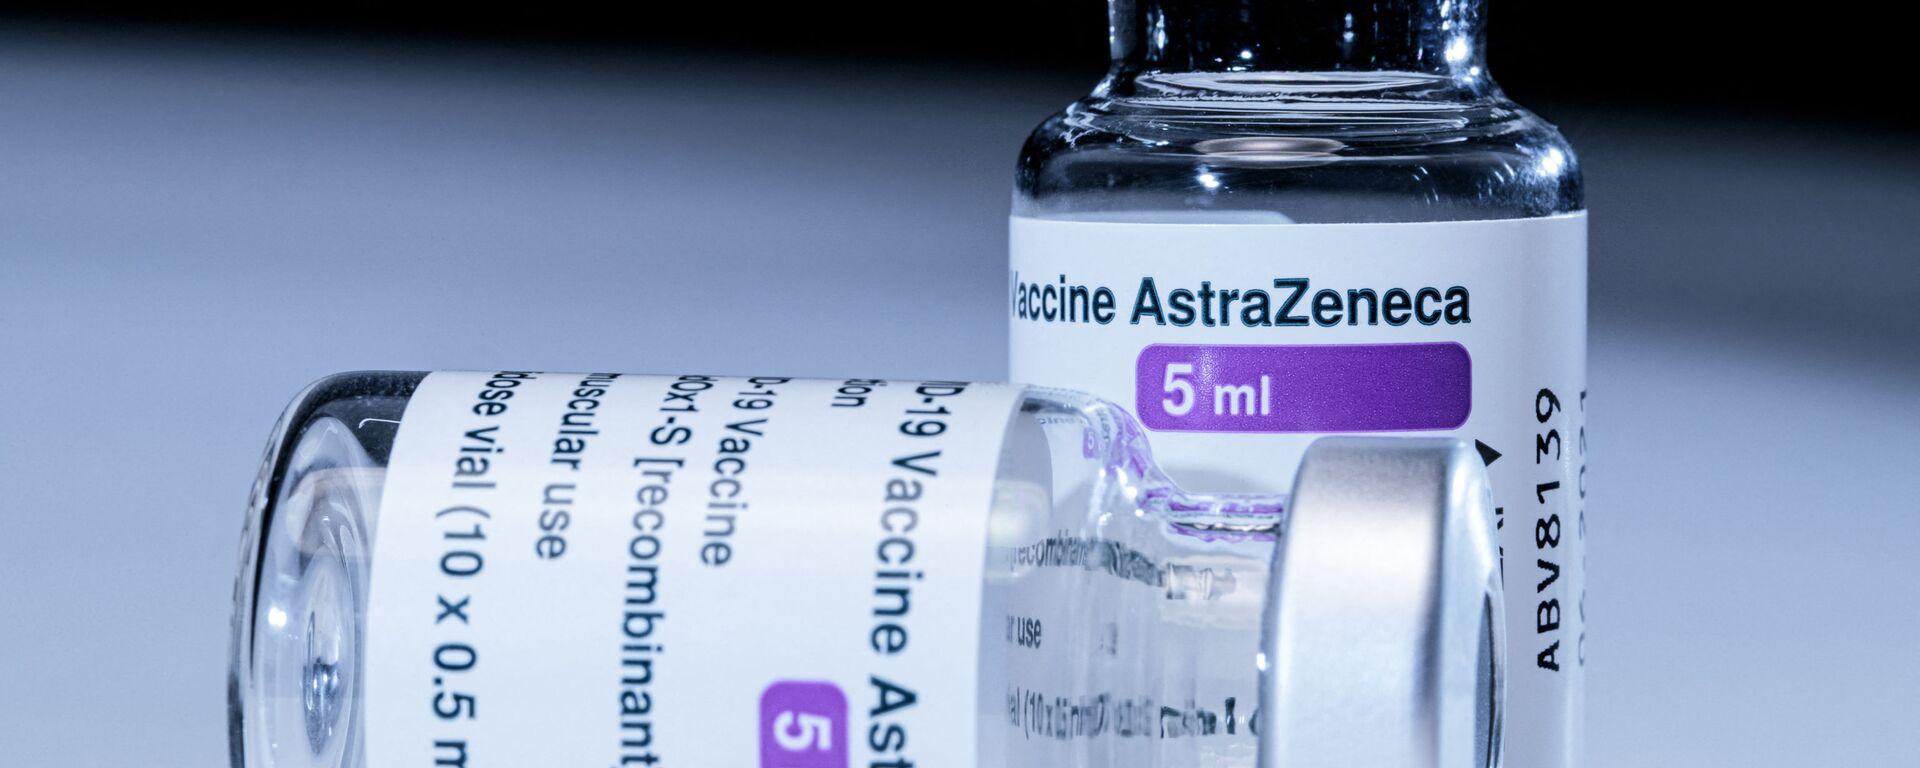 Вакцина AstraZeneca - Sputnik Таджикистан, 1920, 10.08.2021